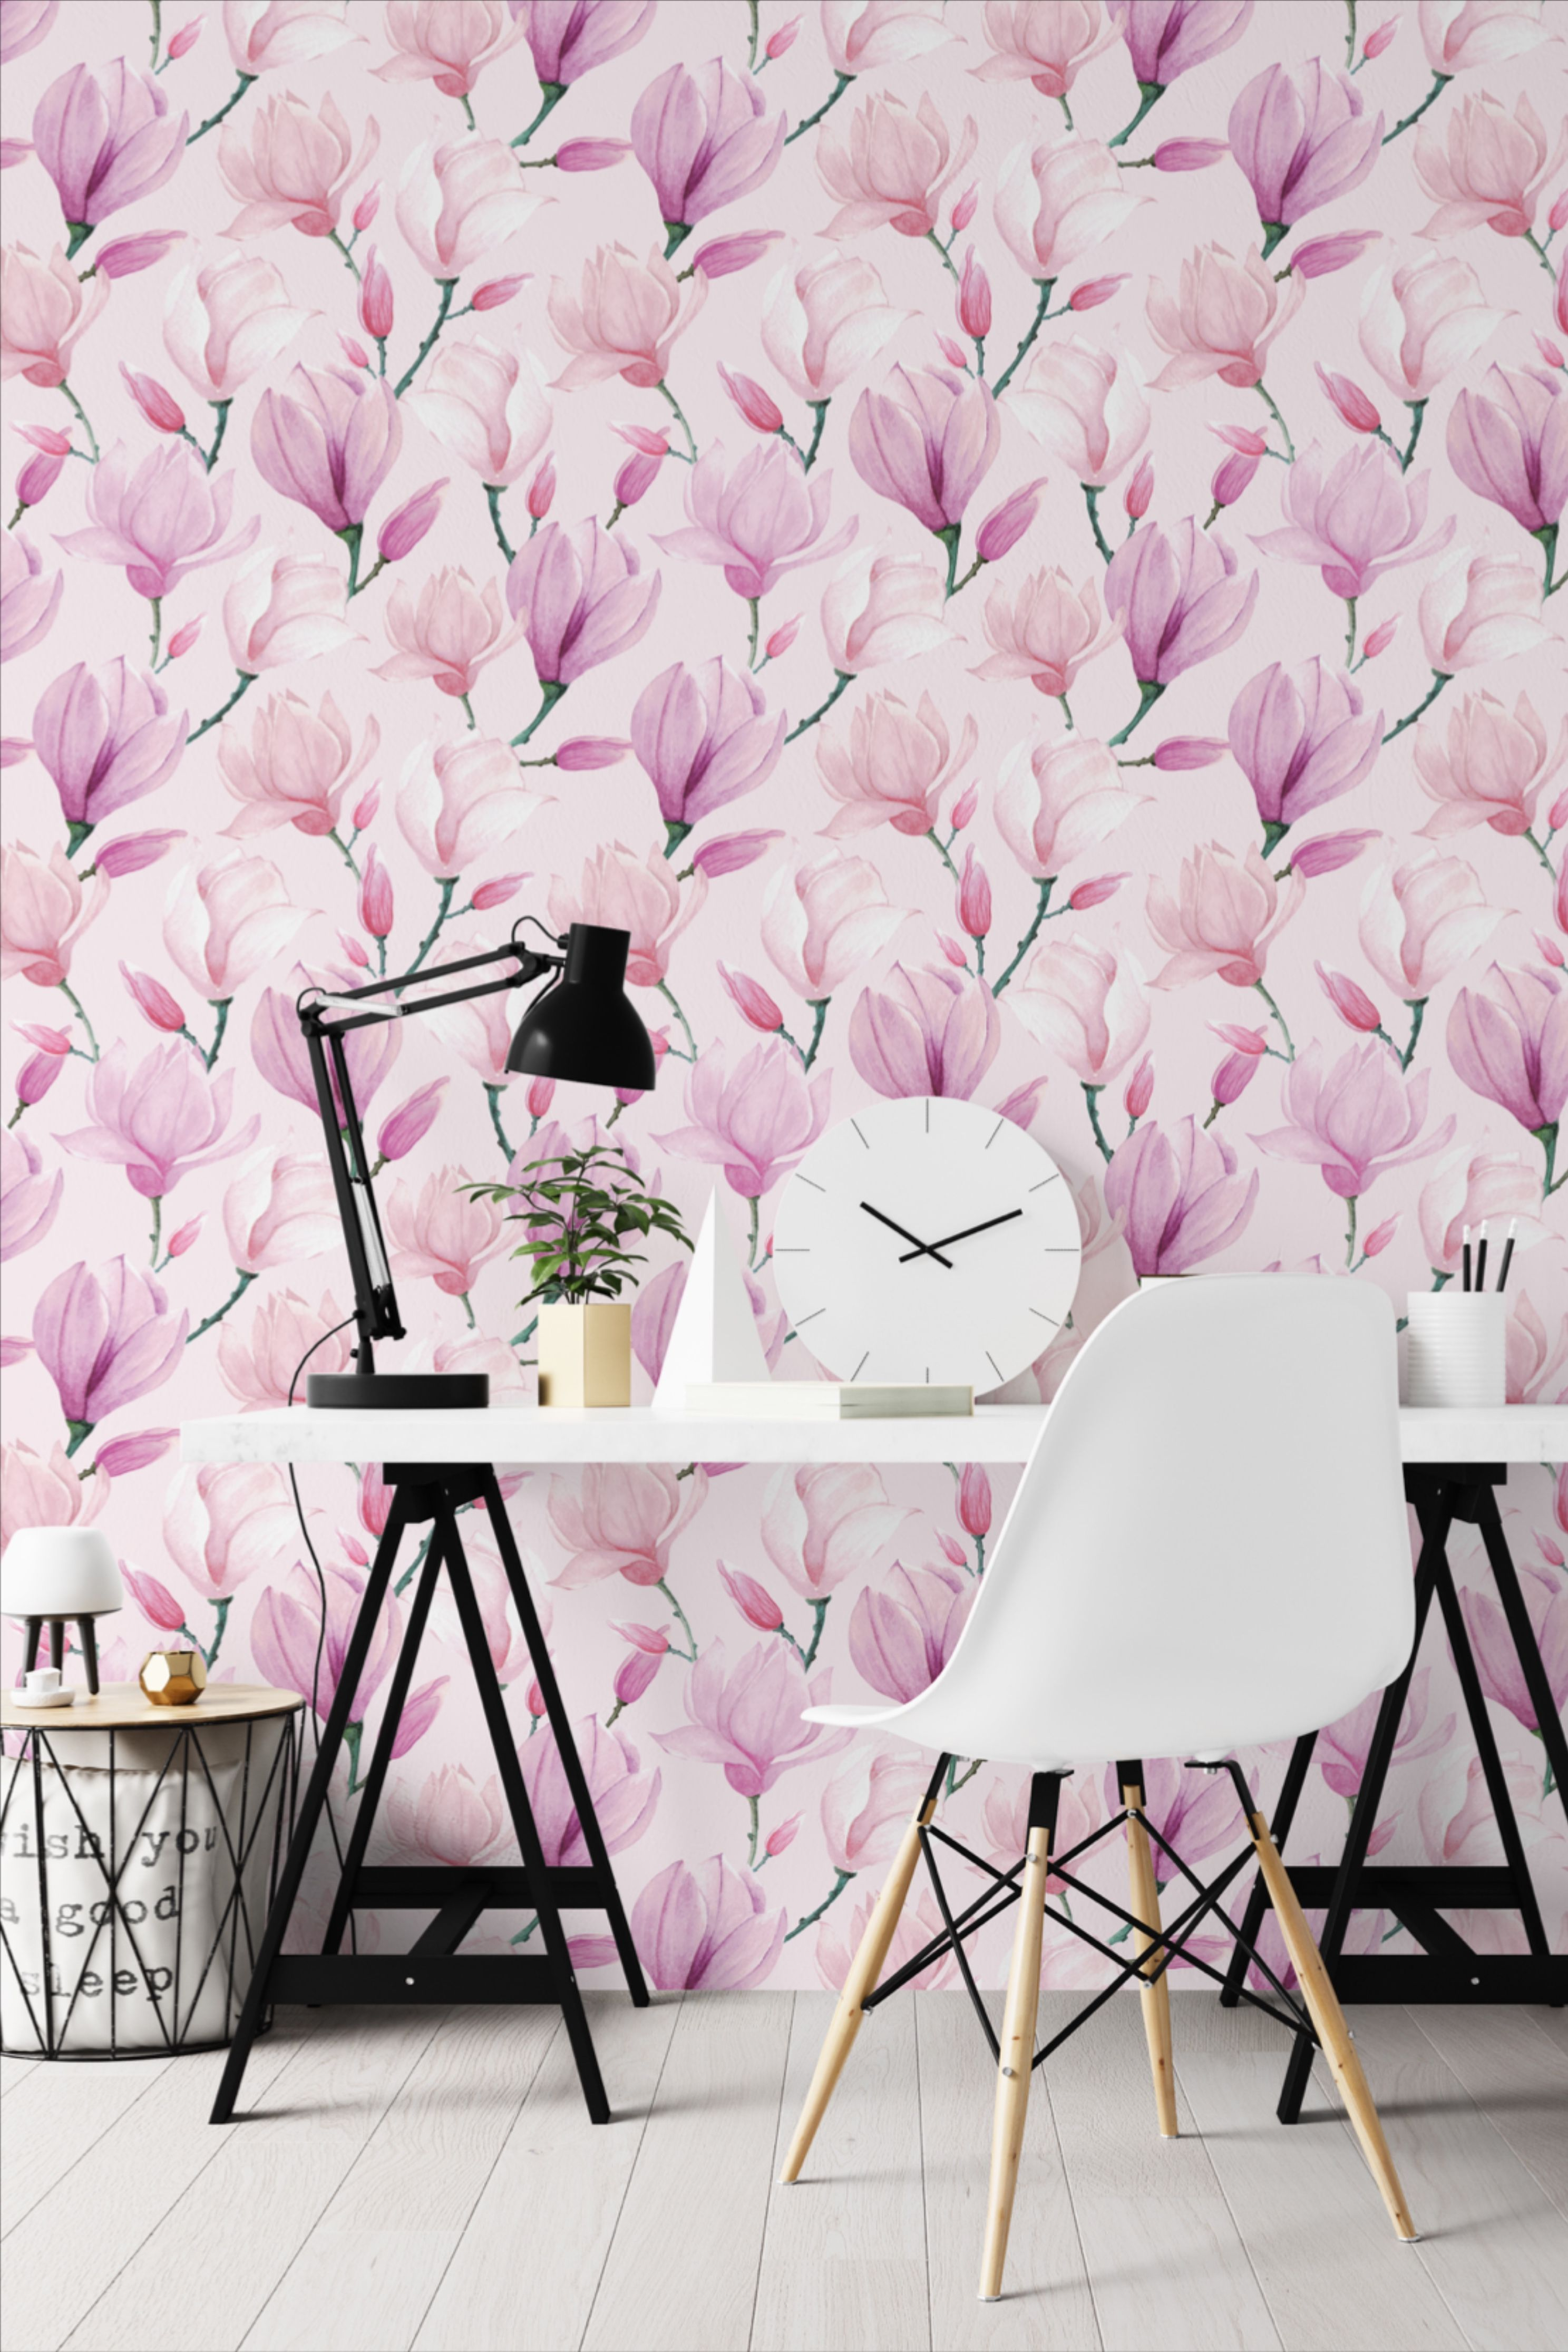 Magnolia Pink Wallpaper Peel And Stick Floral Watercolor Etsy Pink Floral Wallpaper Pink Interiors Design Pink Wallpaper